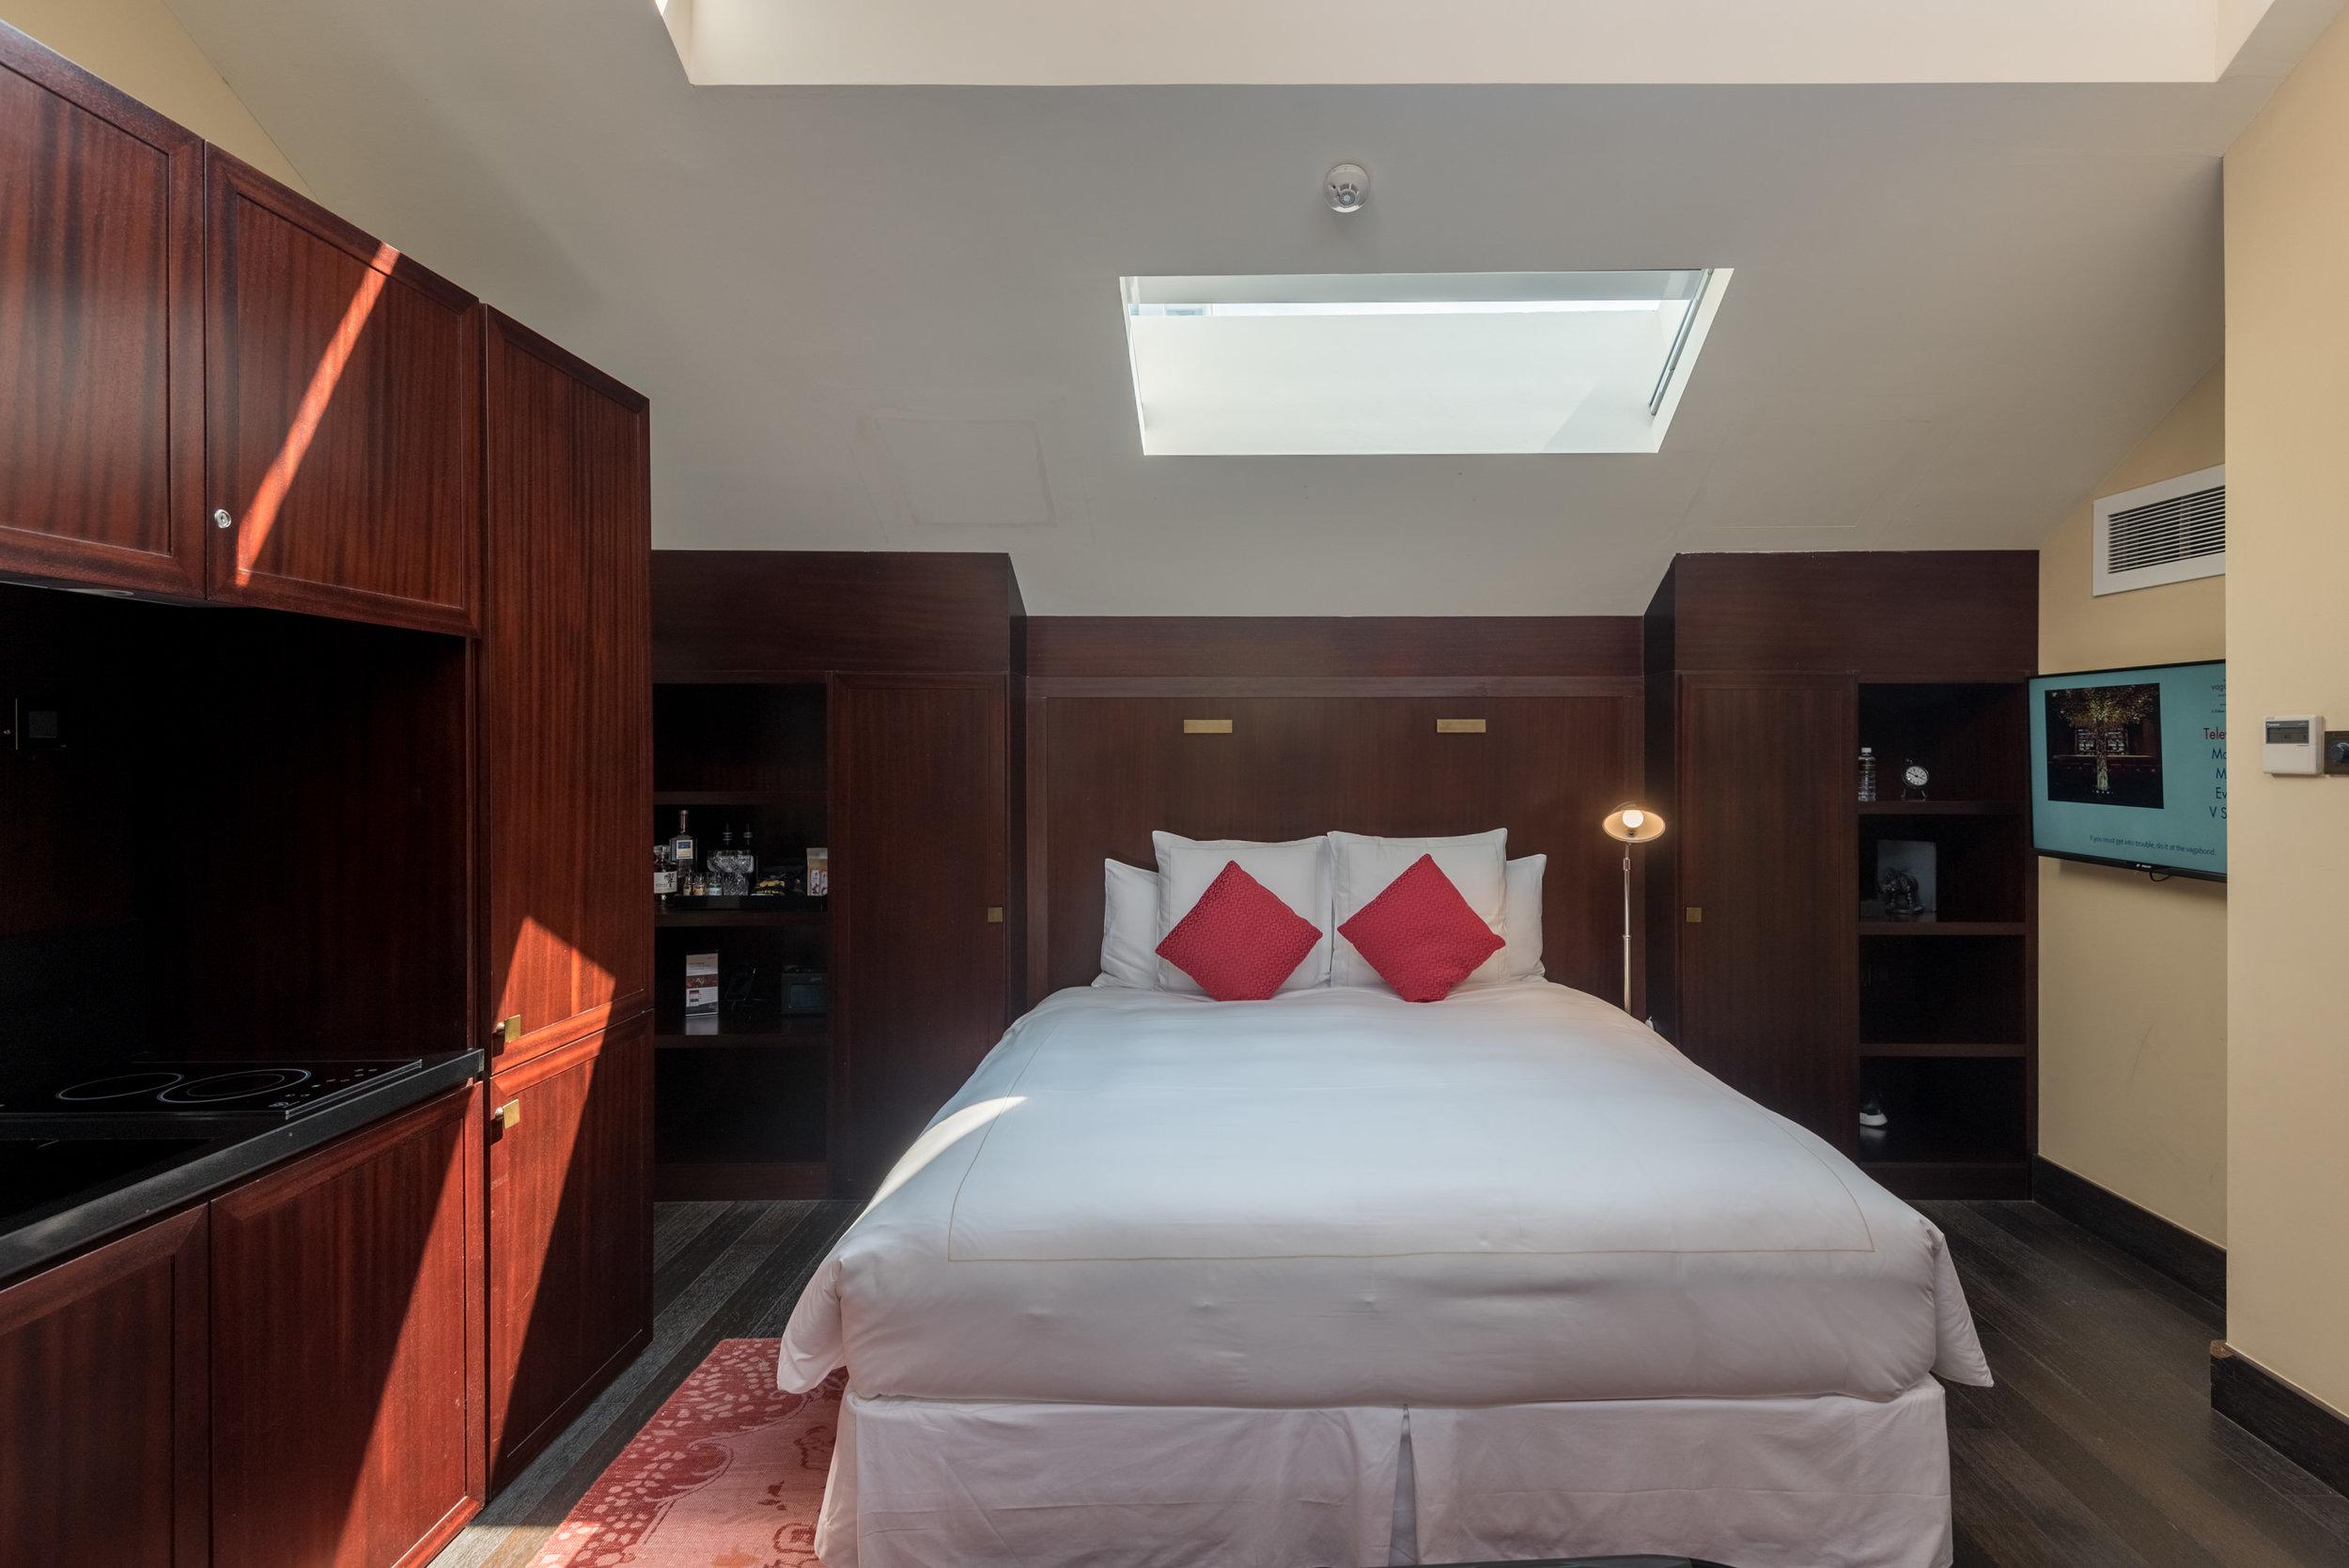 Bed with Skylight  Art Executive Club Suite - The Vagabond Club, A Tribute Portfolio Hotel, Singapore